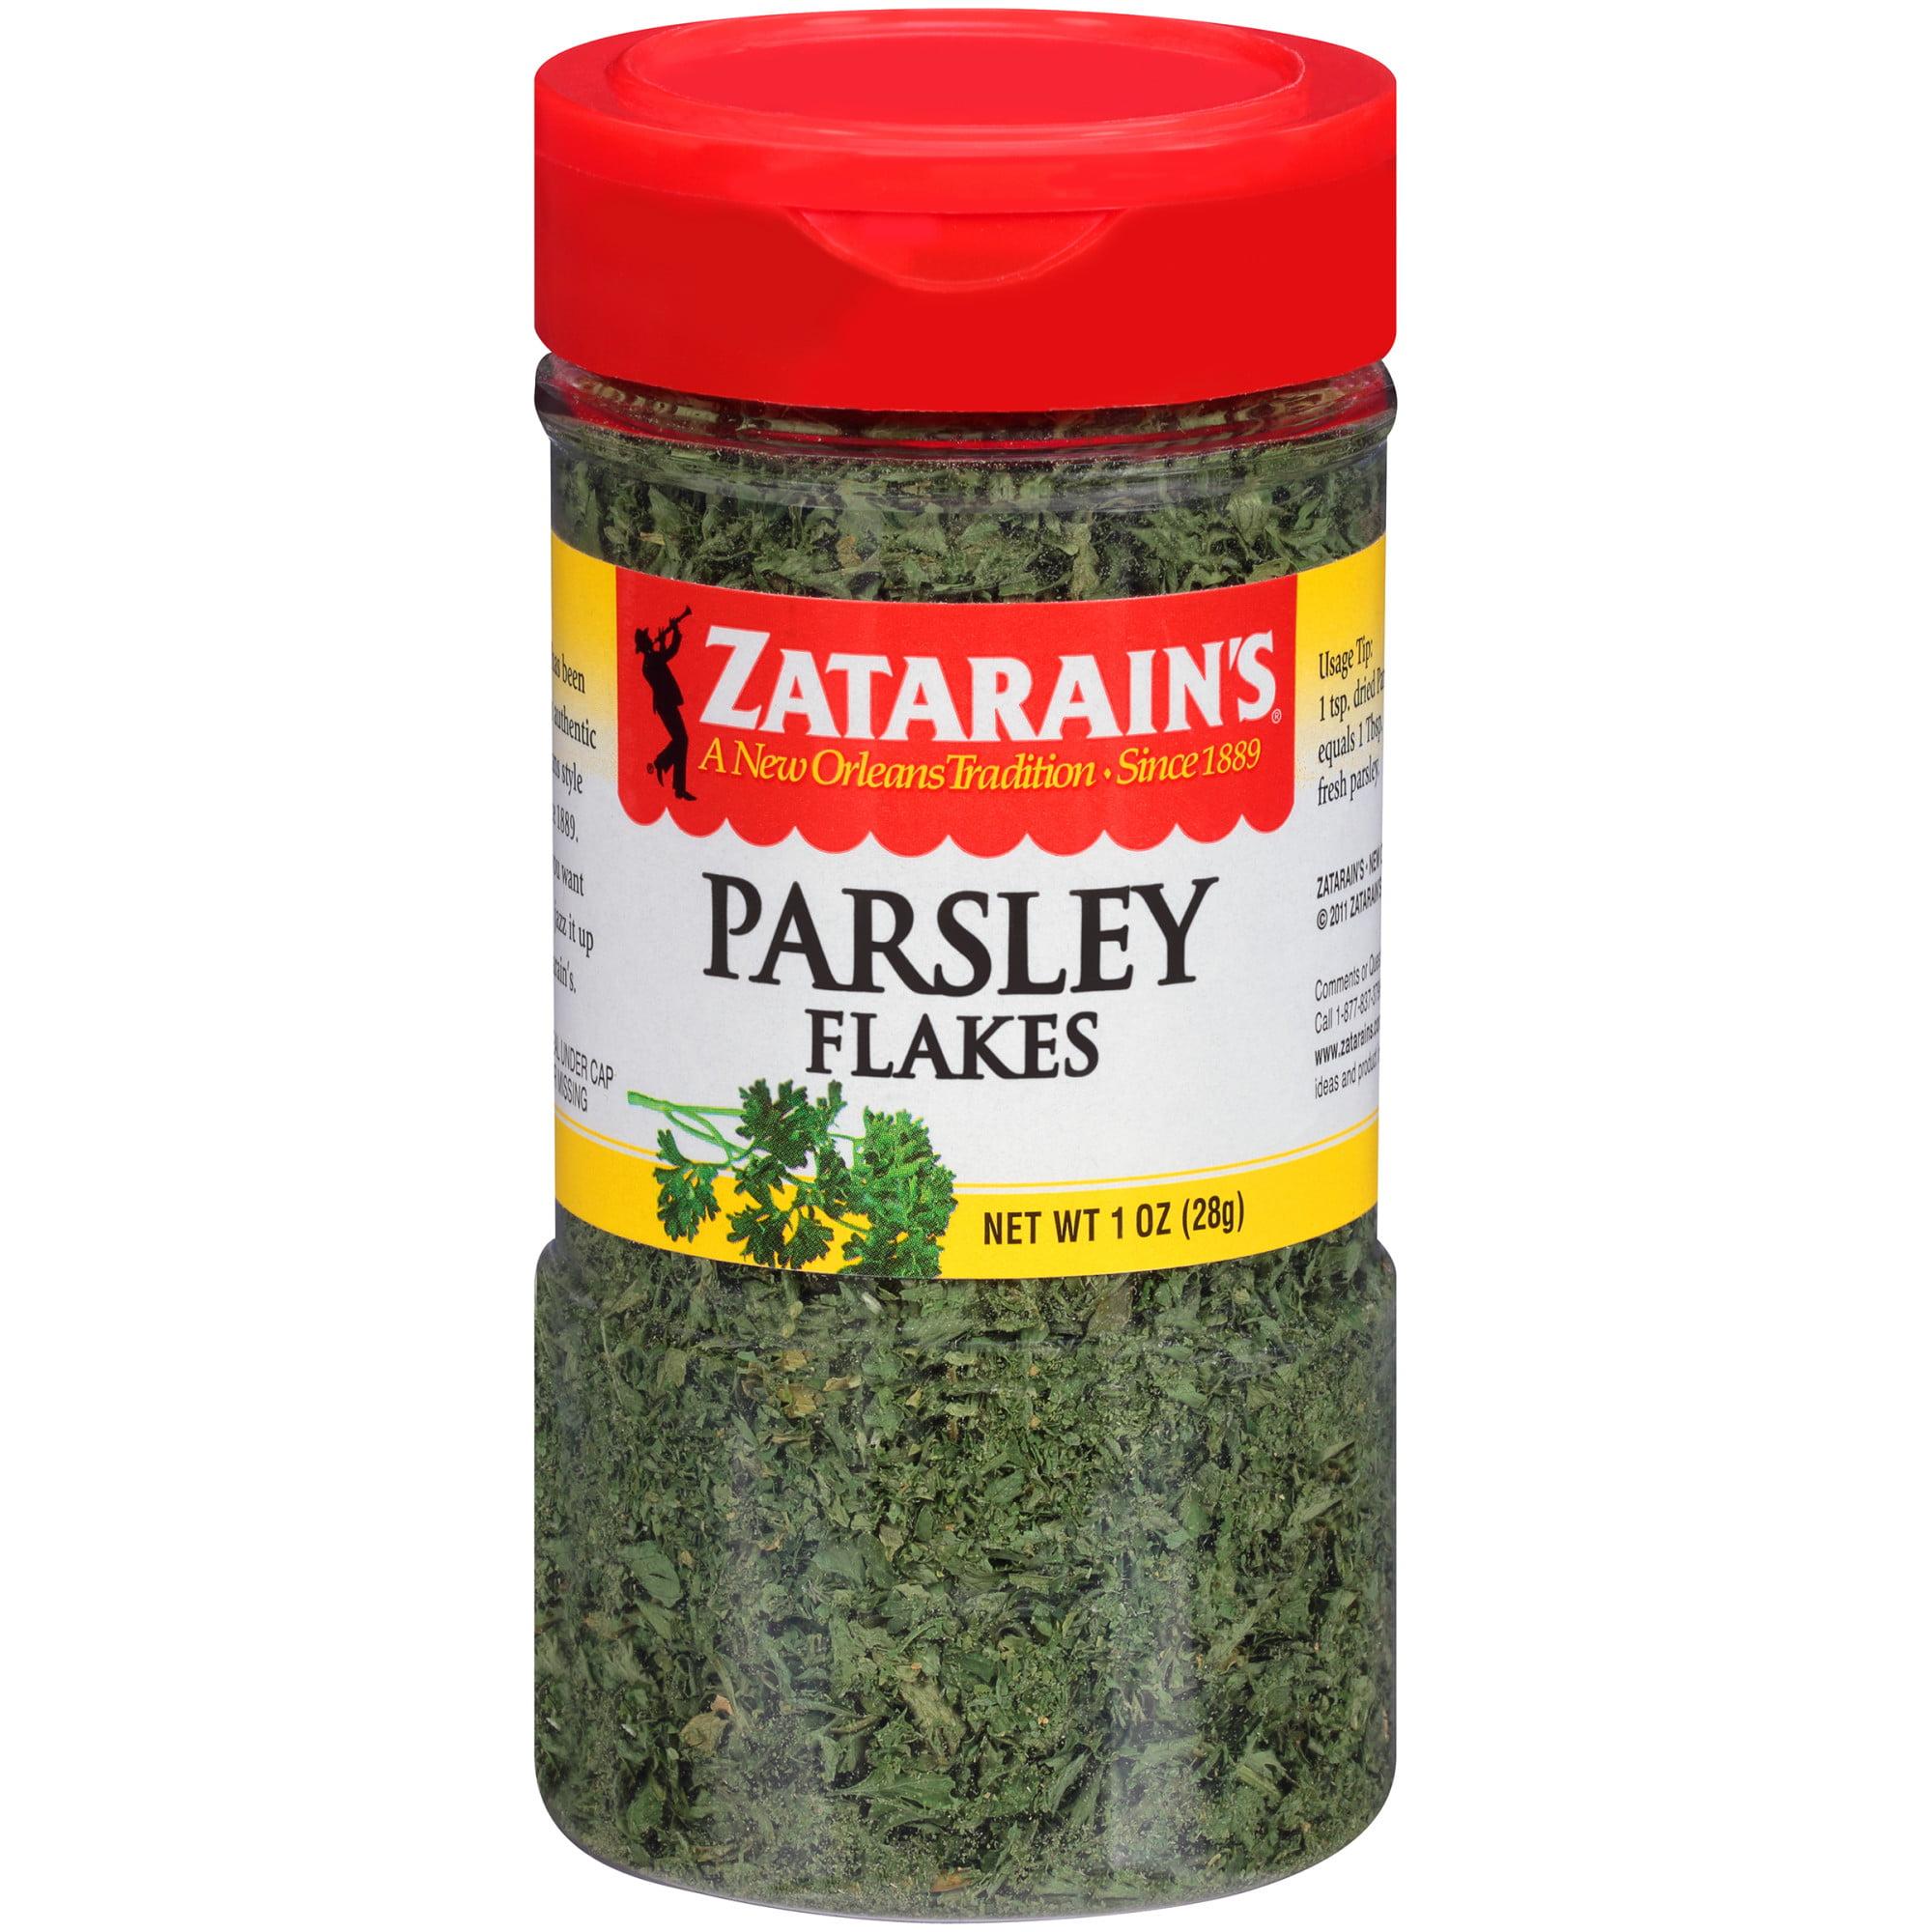 (2 Pack) Zatarain's Parsley Flakes, 1 oz